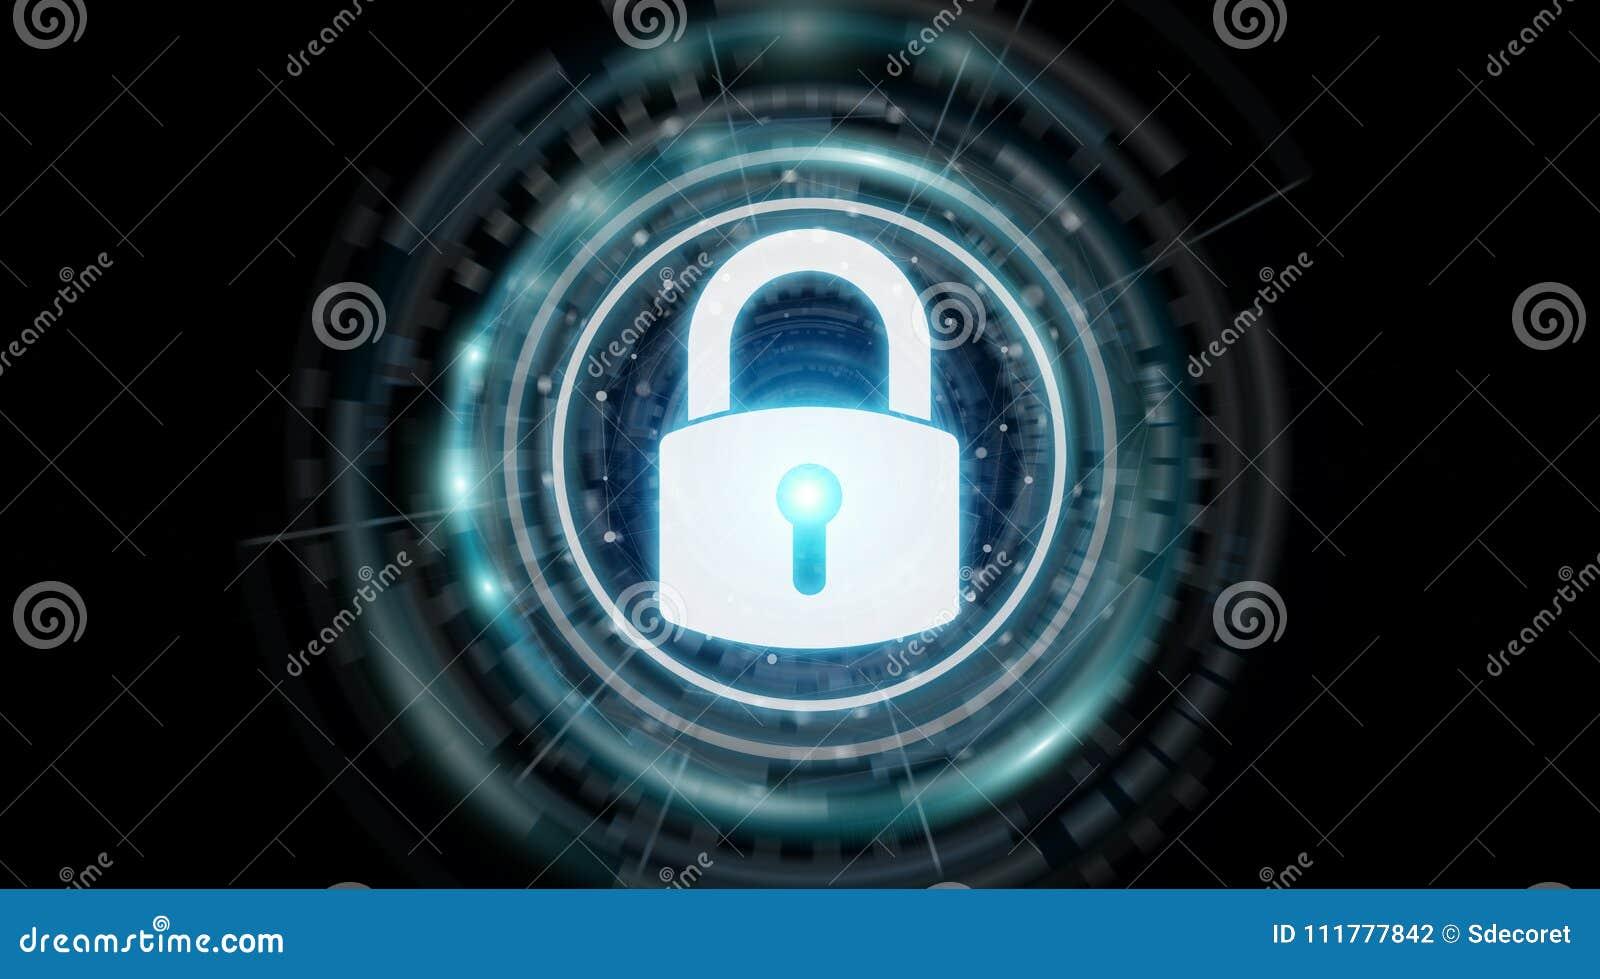 Padlock security interface protecting datas 3D rendering